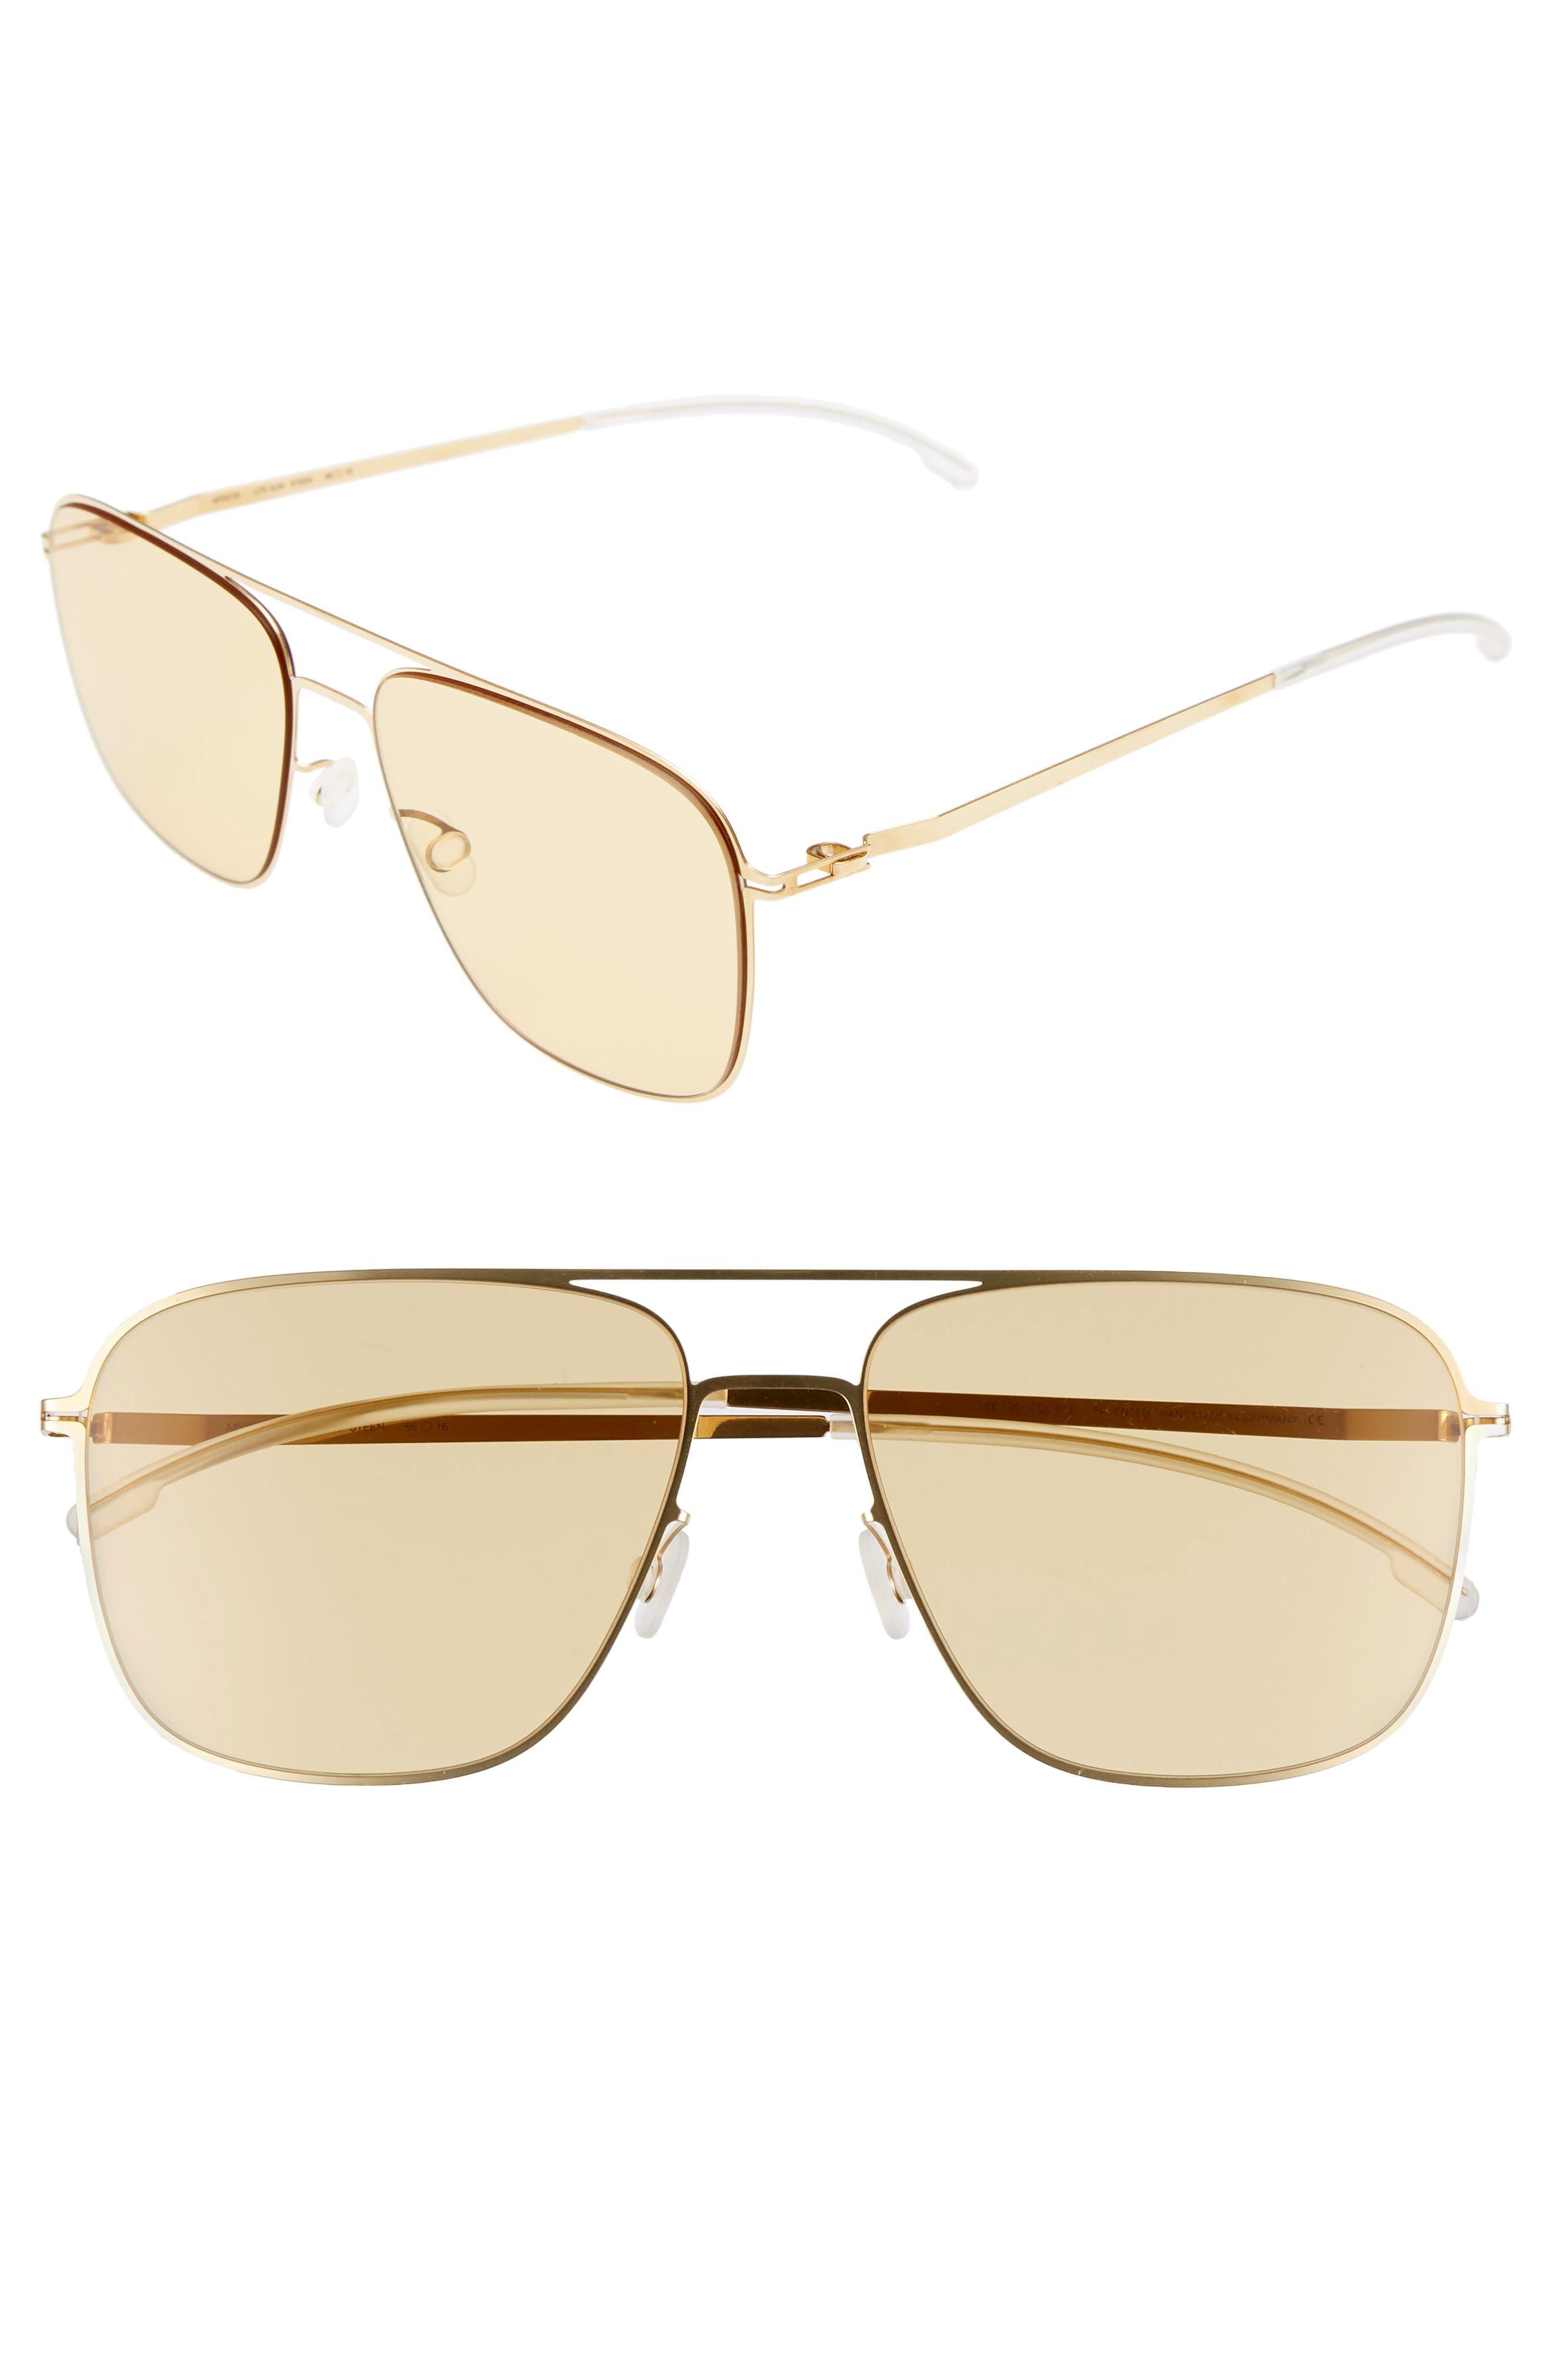 Steen 56mm Aviator Sunglasses,                         Main,                         color, Glossy Gold